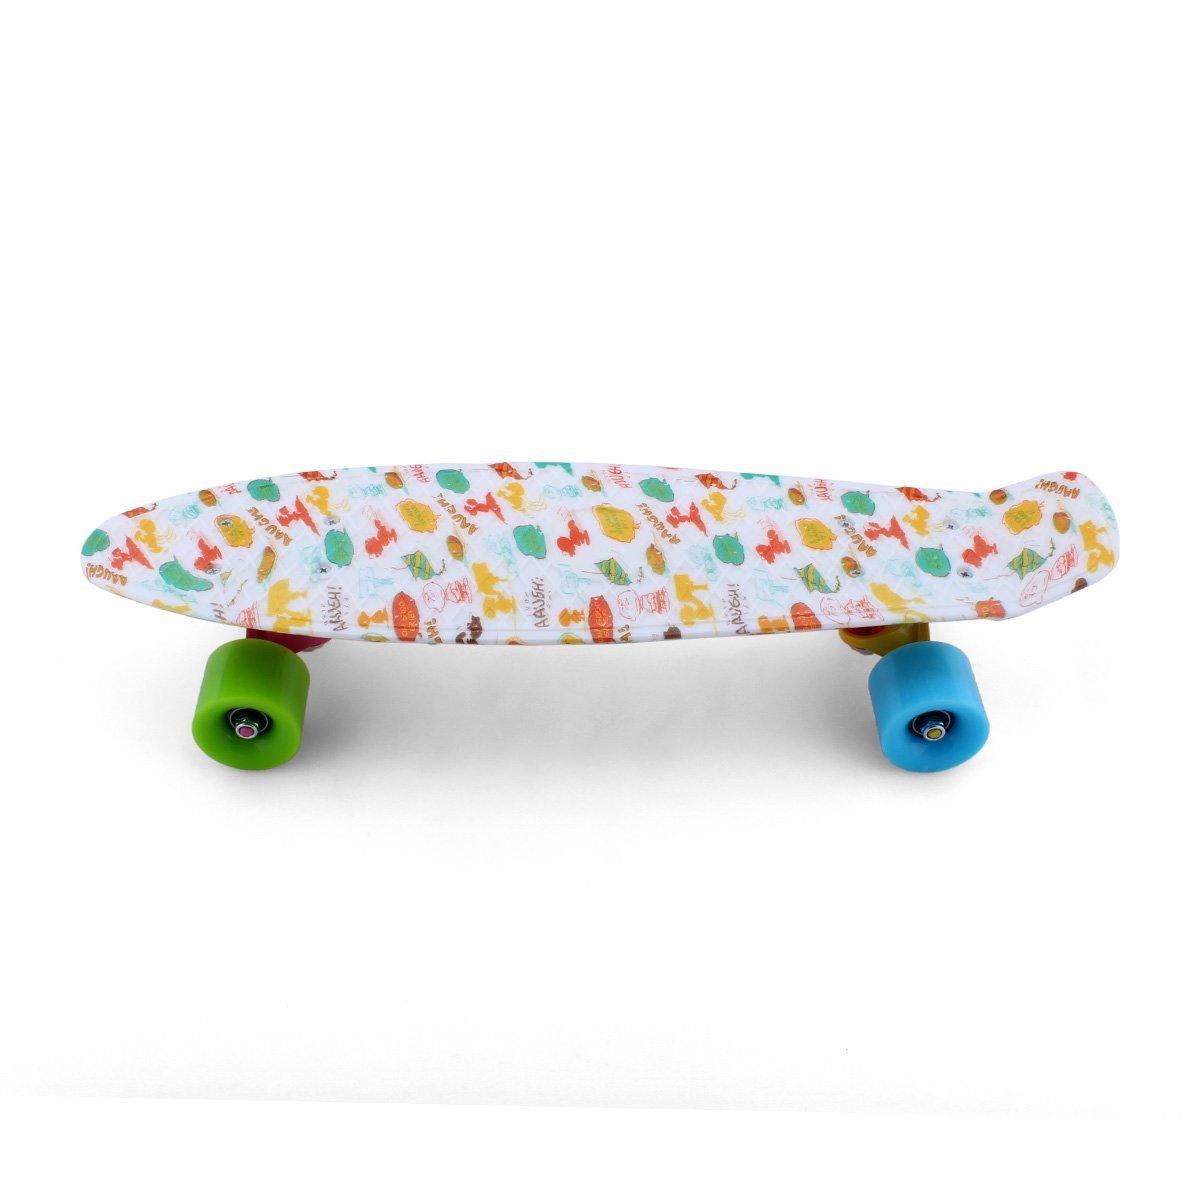 "Skateboards skateboards for kids Mini Board Complete 22"" Retro Skateboards New For Penny Style Plastic skateboards skateboards for boys/girls Cartoon"